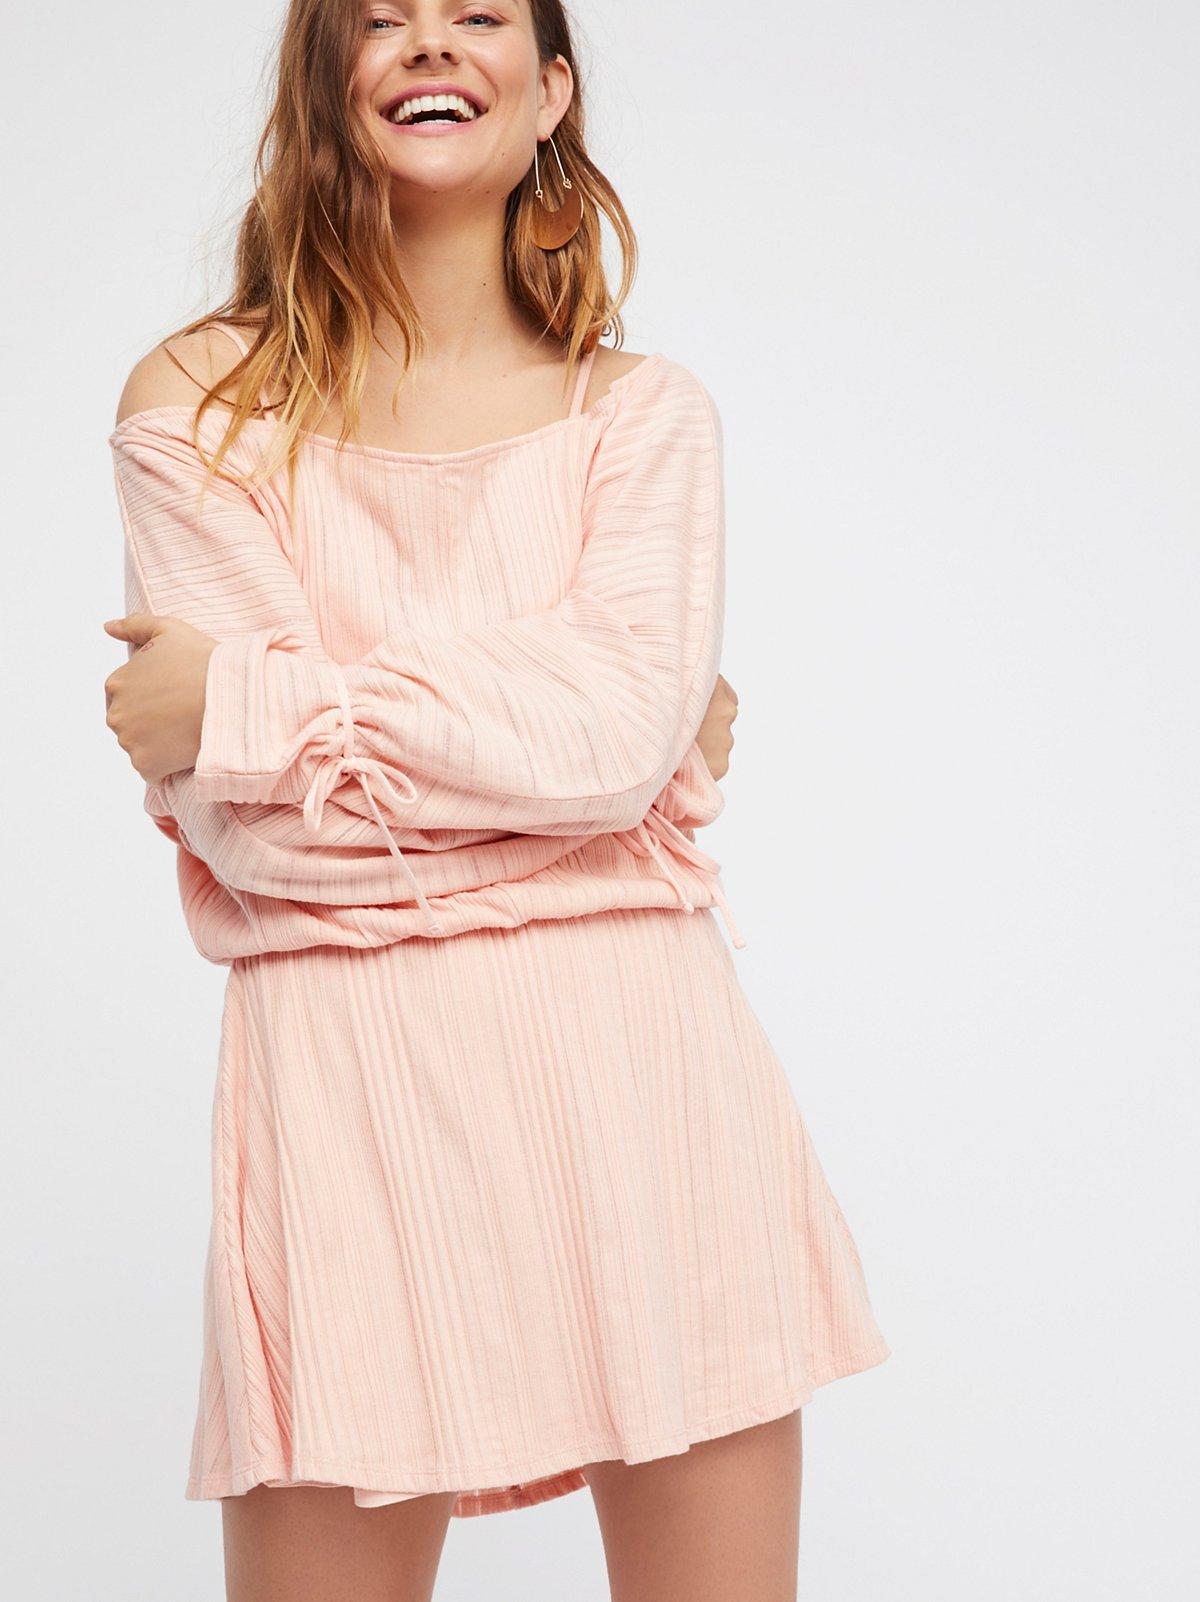 Soak Up The Sun Mini Dress